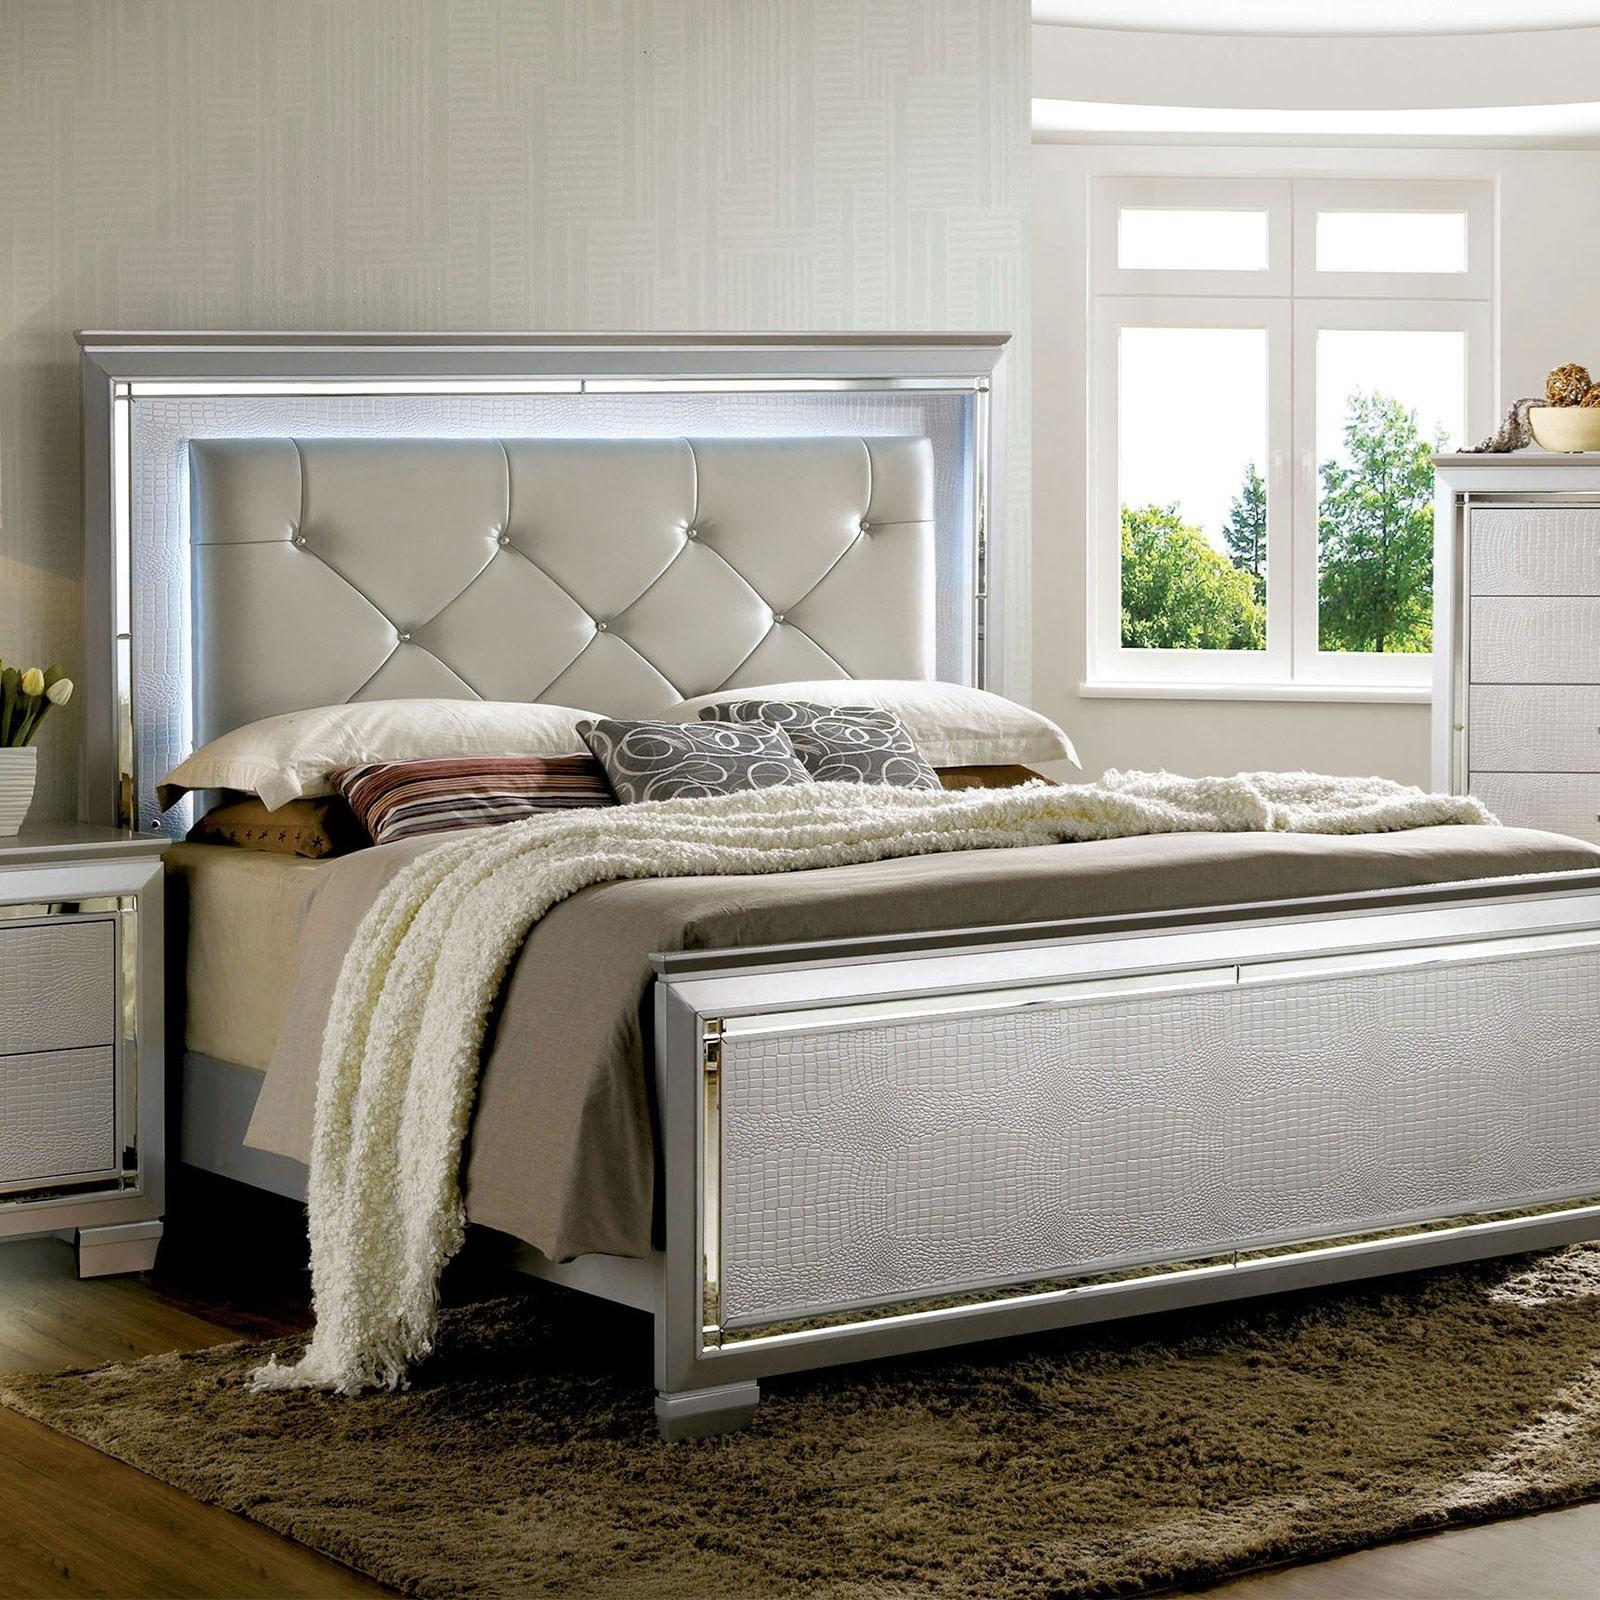 Bellanova King Bed at Household Furniture